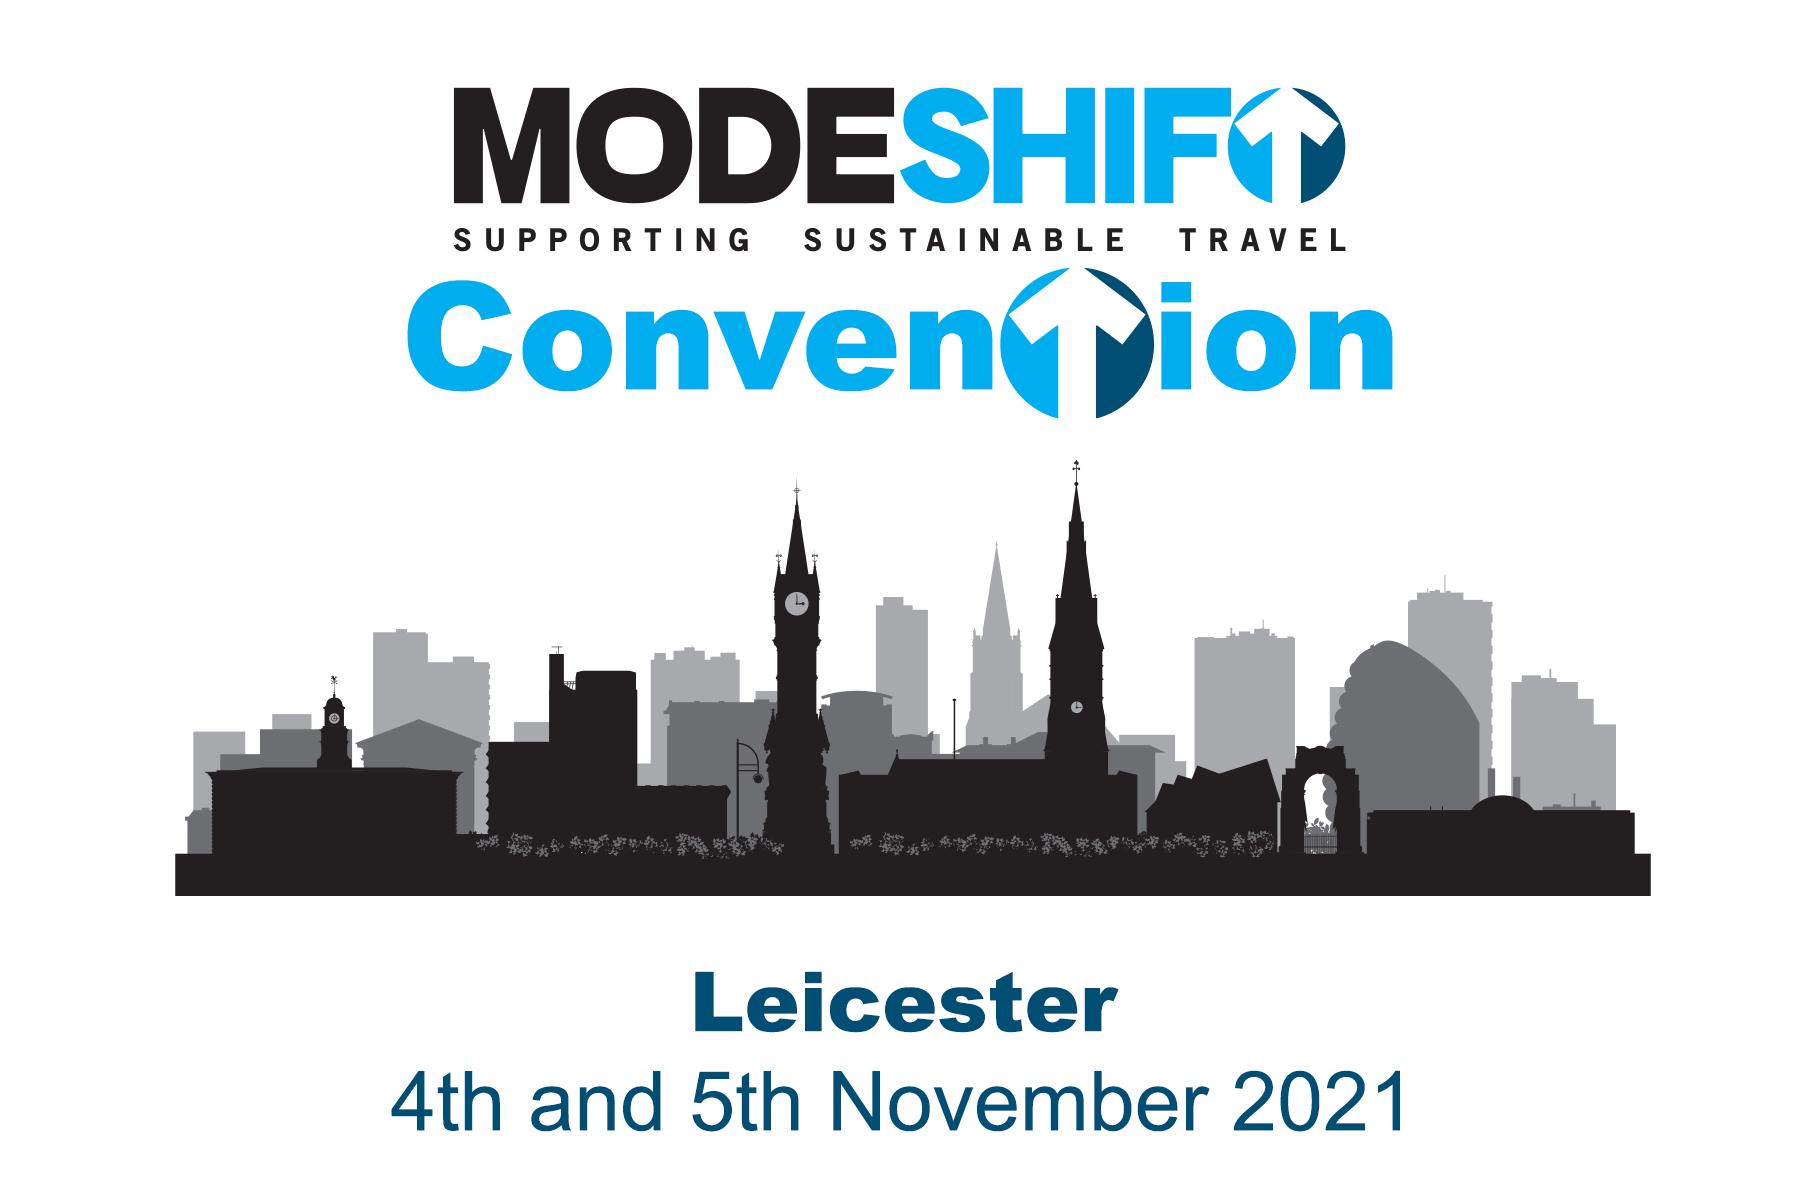 Modeshift Convention 2021